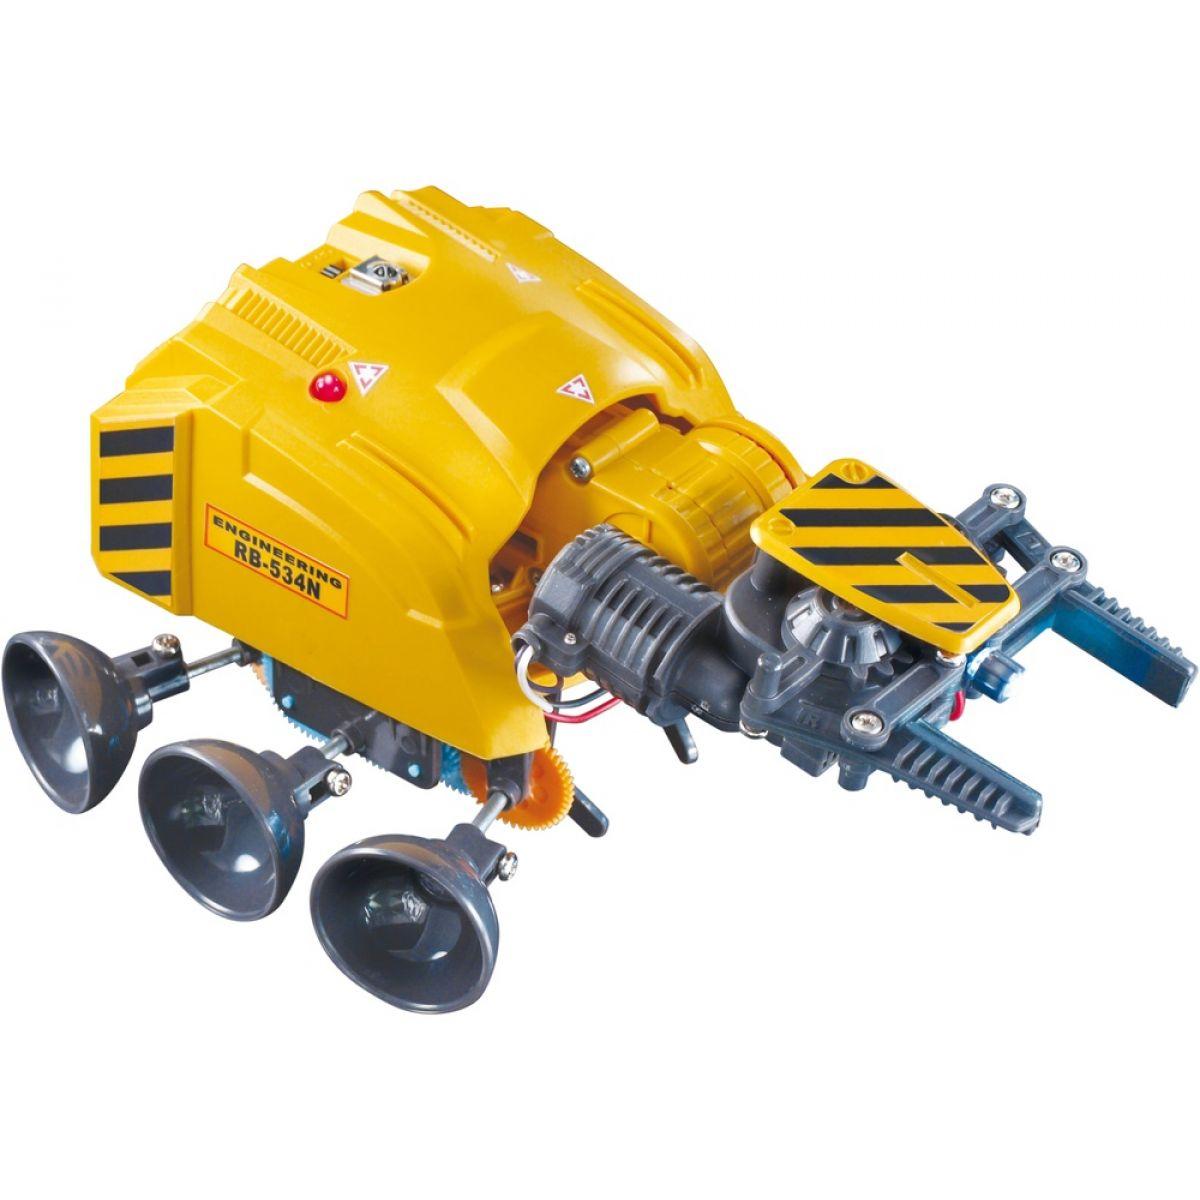 Buddy Toys RC Stavebnice Robotic Beetle